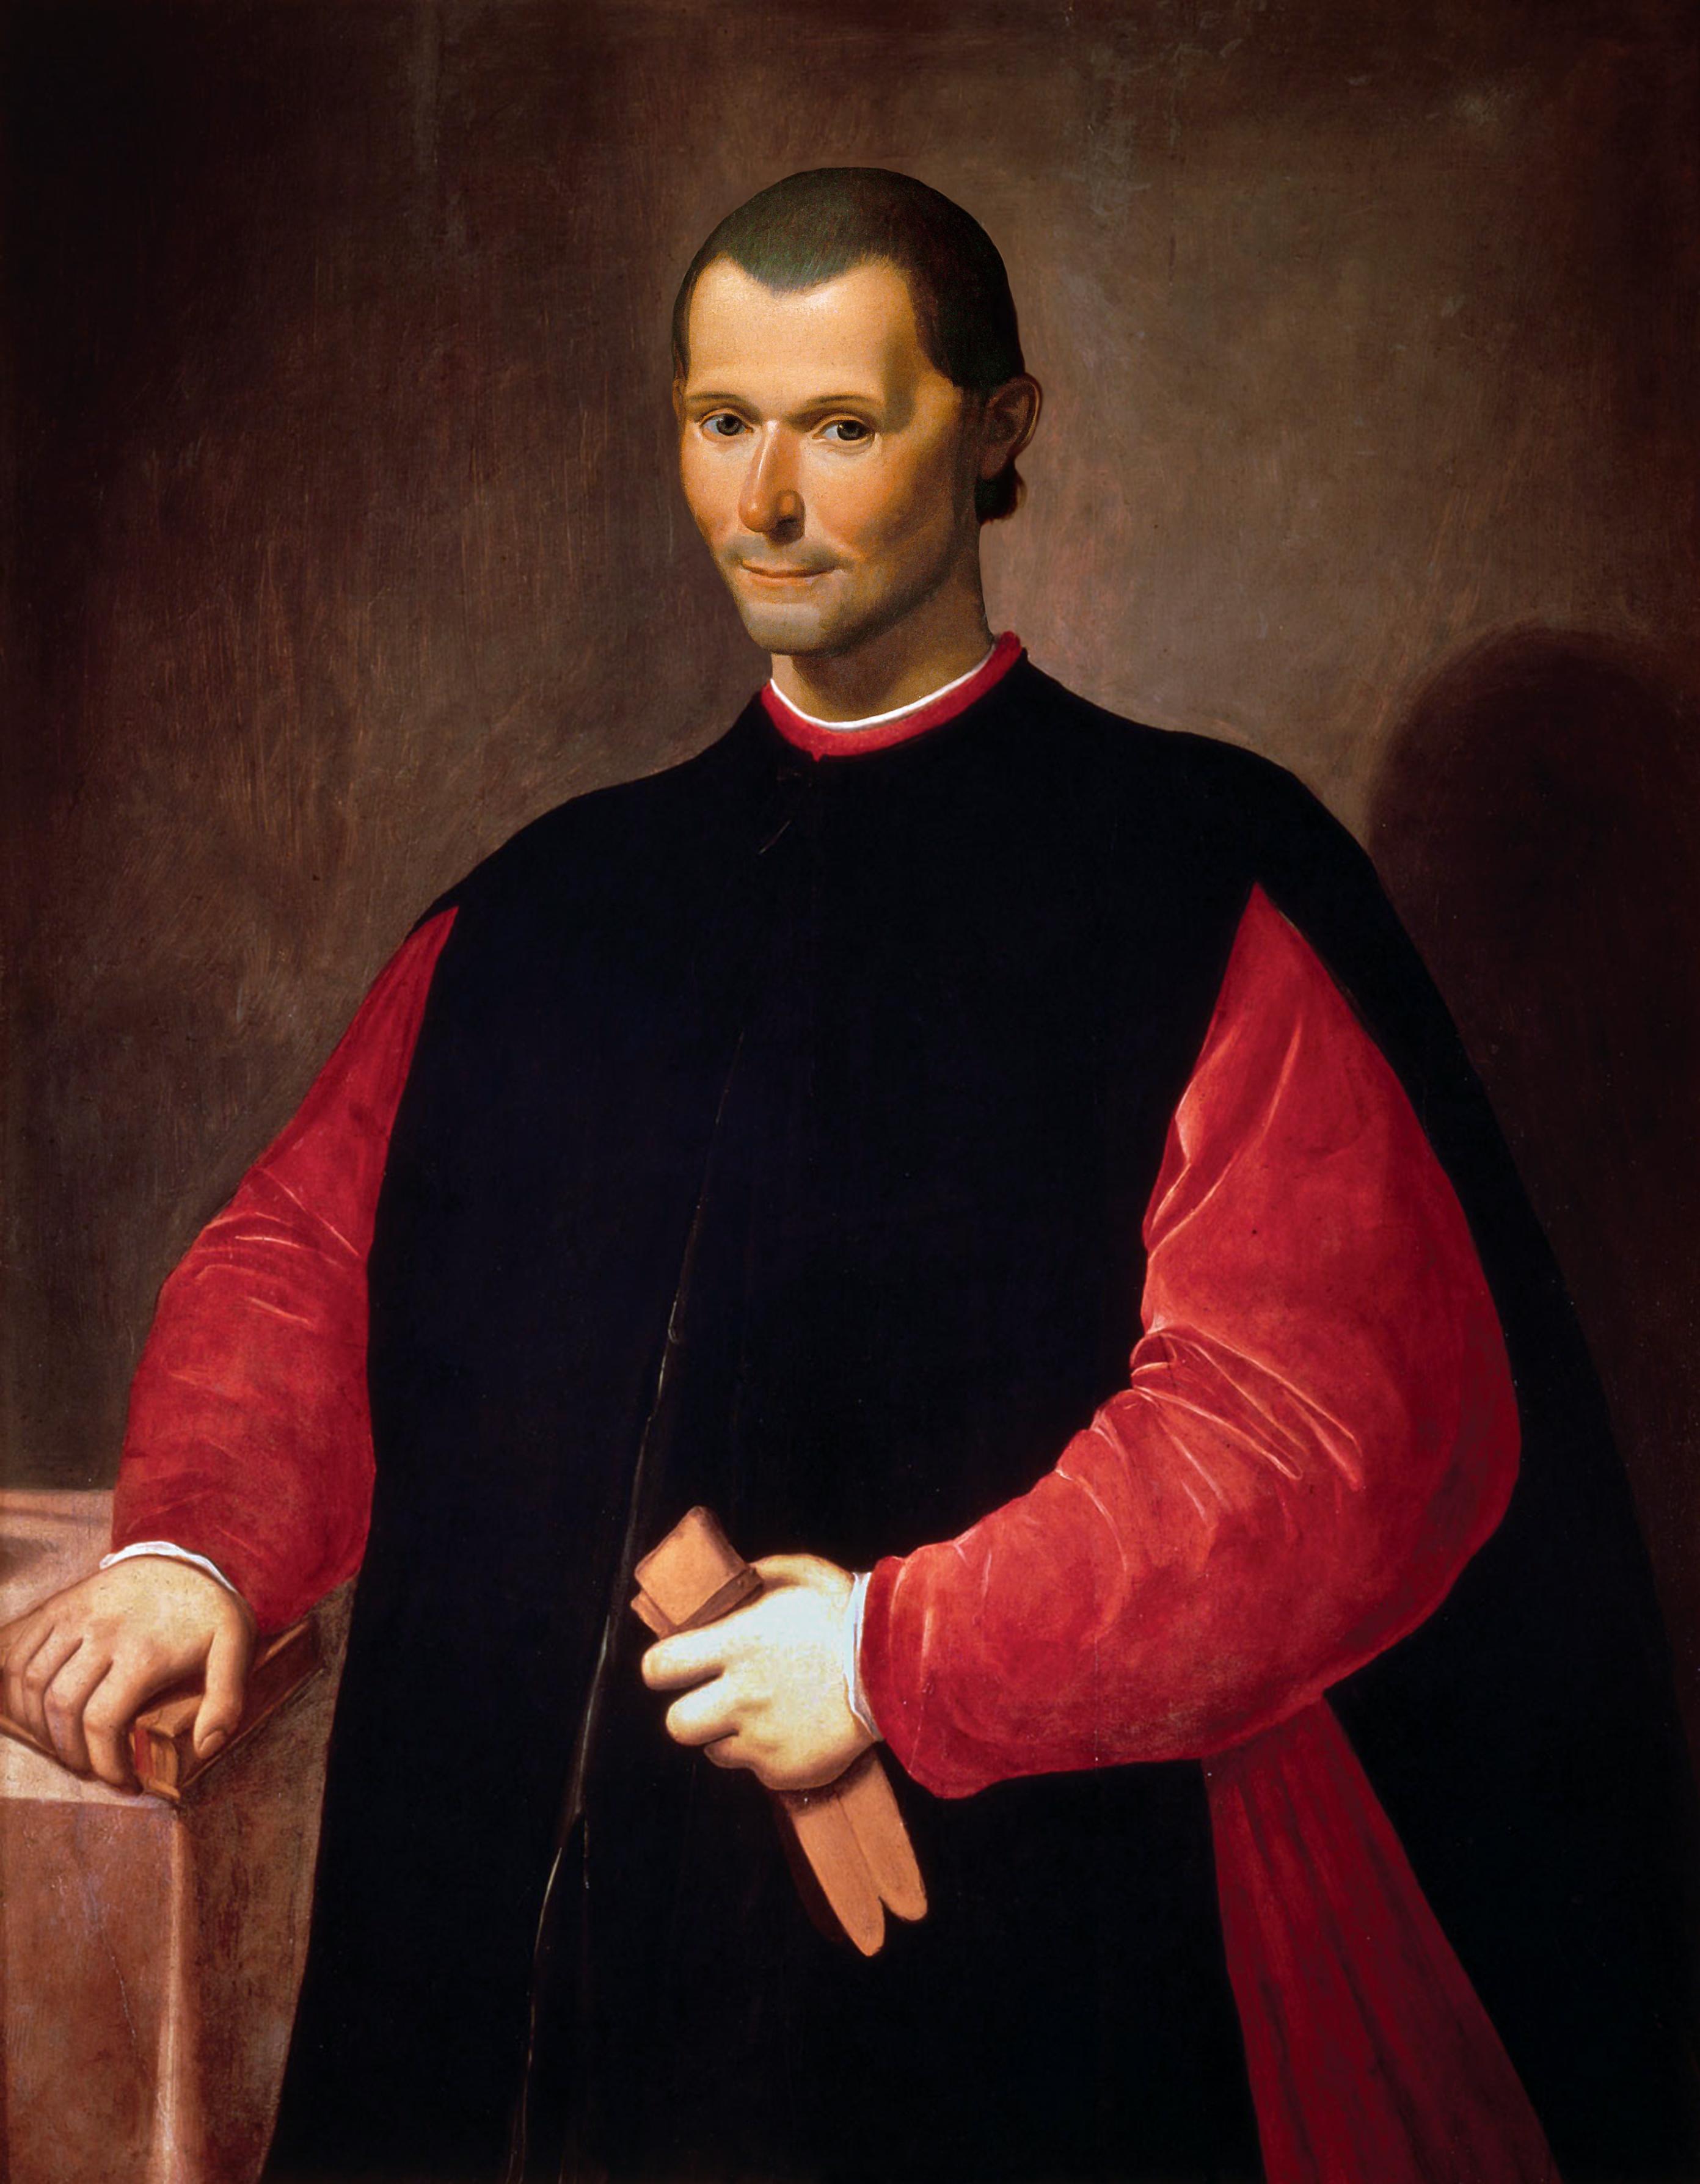 Poet Niccolo Machiavelli